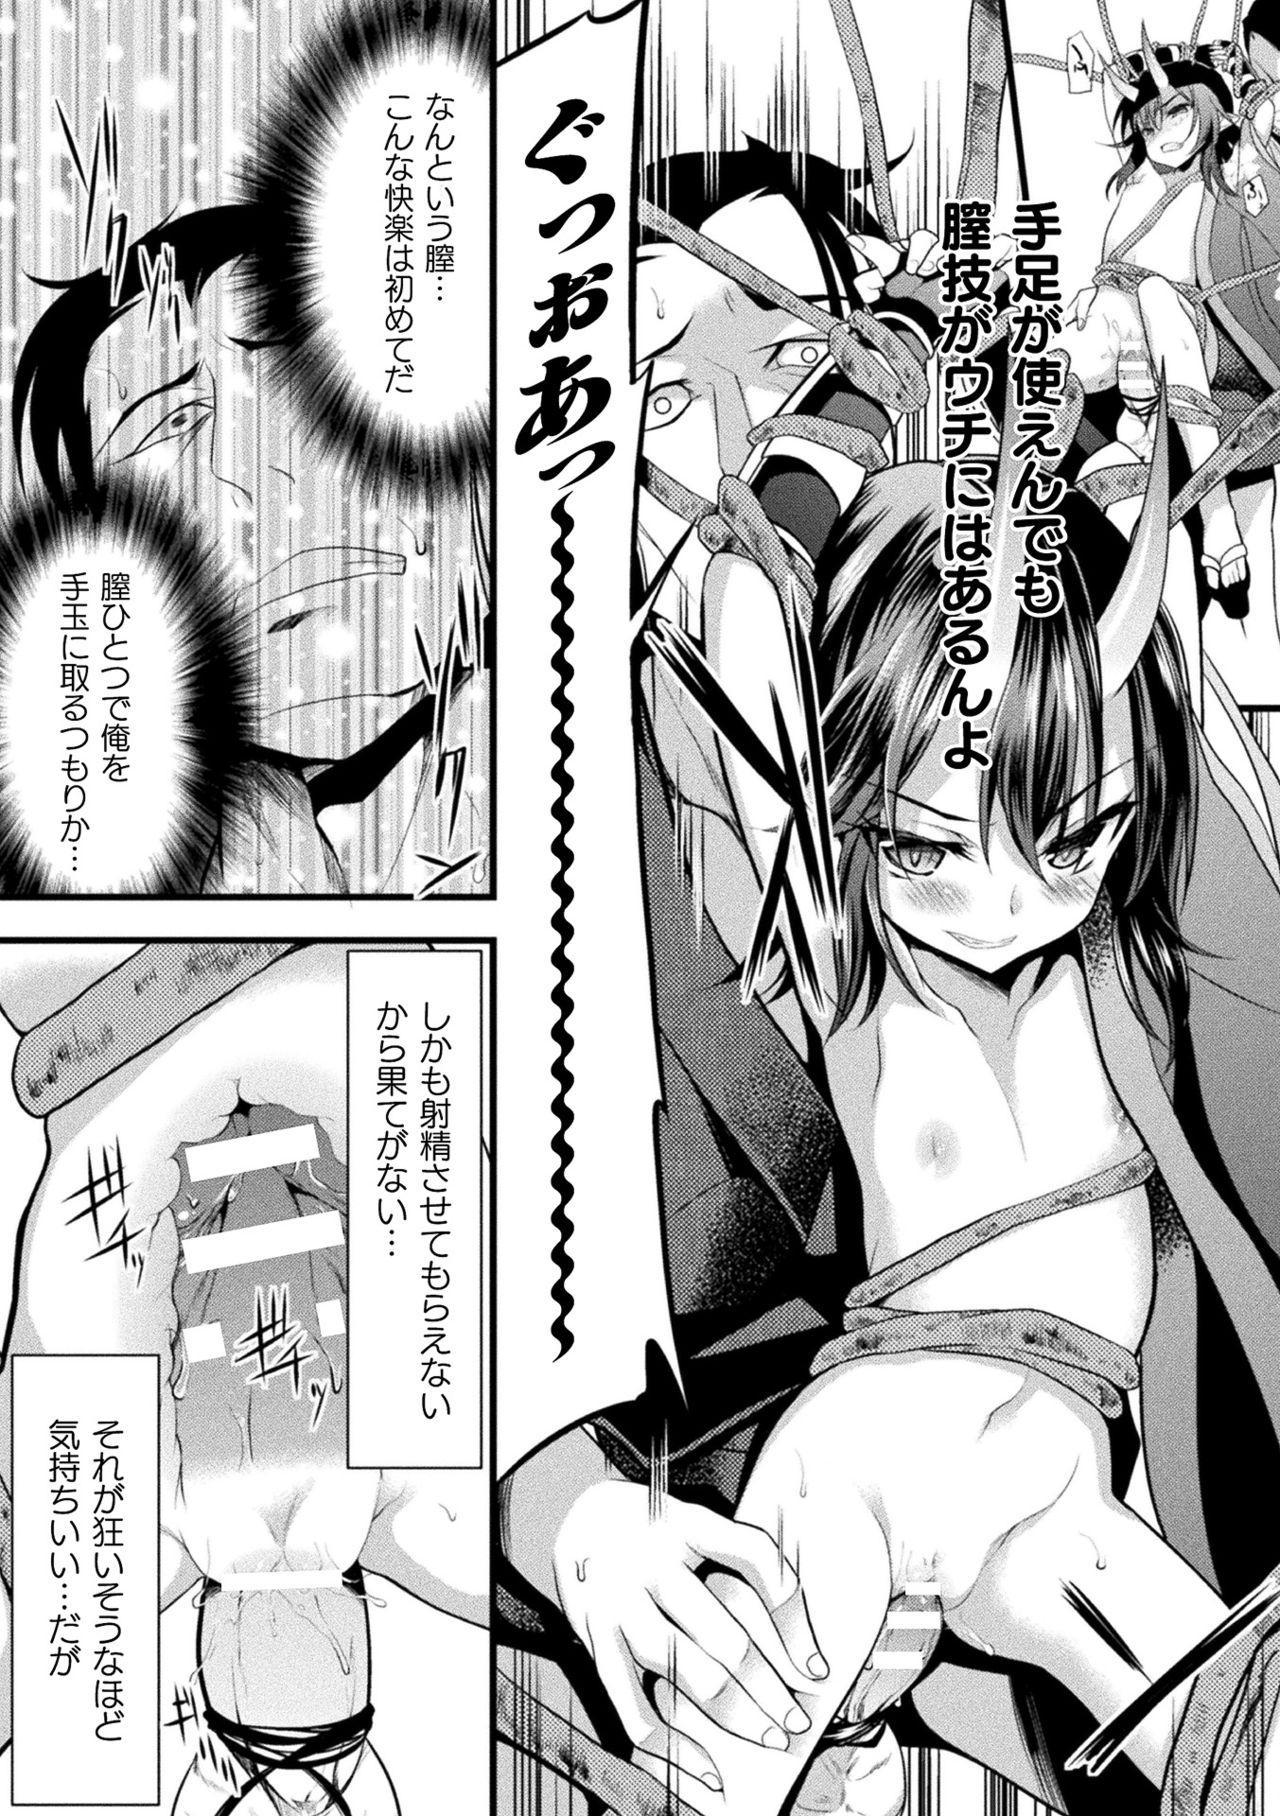 Loli-babaa Kyousei Tanetsuke Ecchi! Vol. 2 32